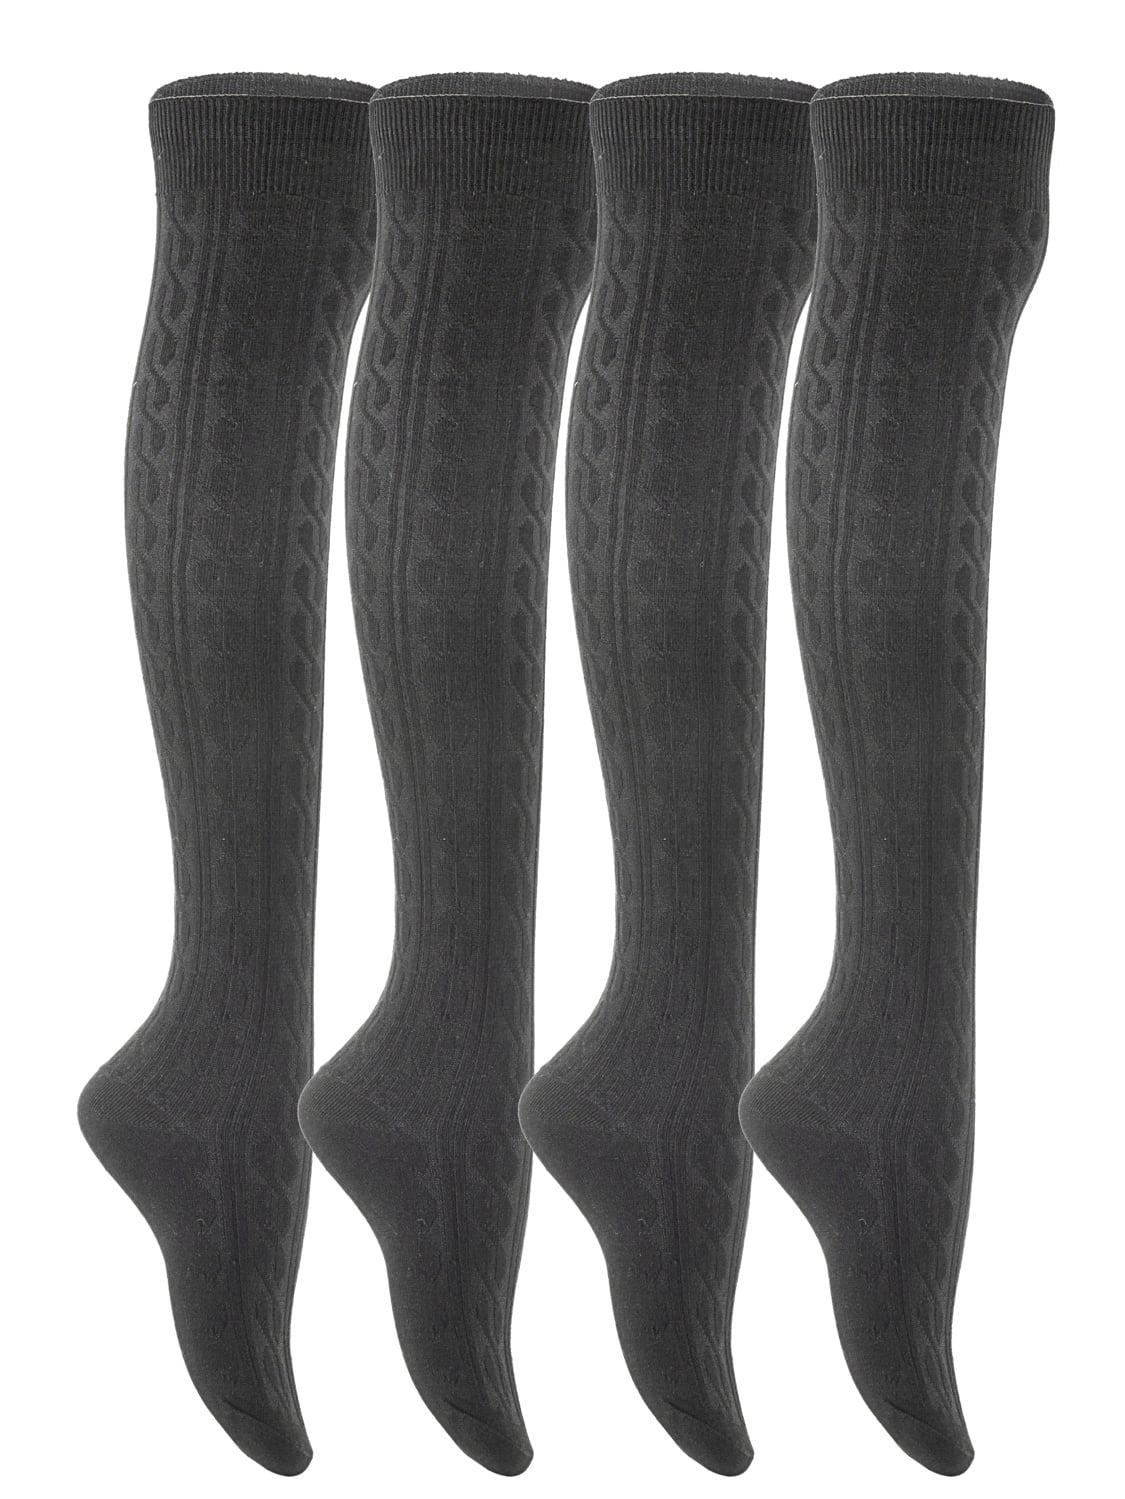 Lian LifeStyle Big Girls' 4 Pairs Over Knee High Cotton Boot Socks JMYP1024 Size L/XL(Black,Dark Grey,Grey,Cream White)